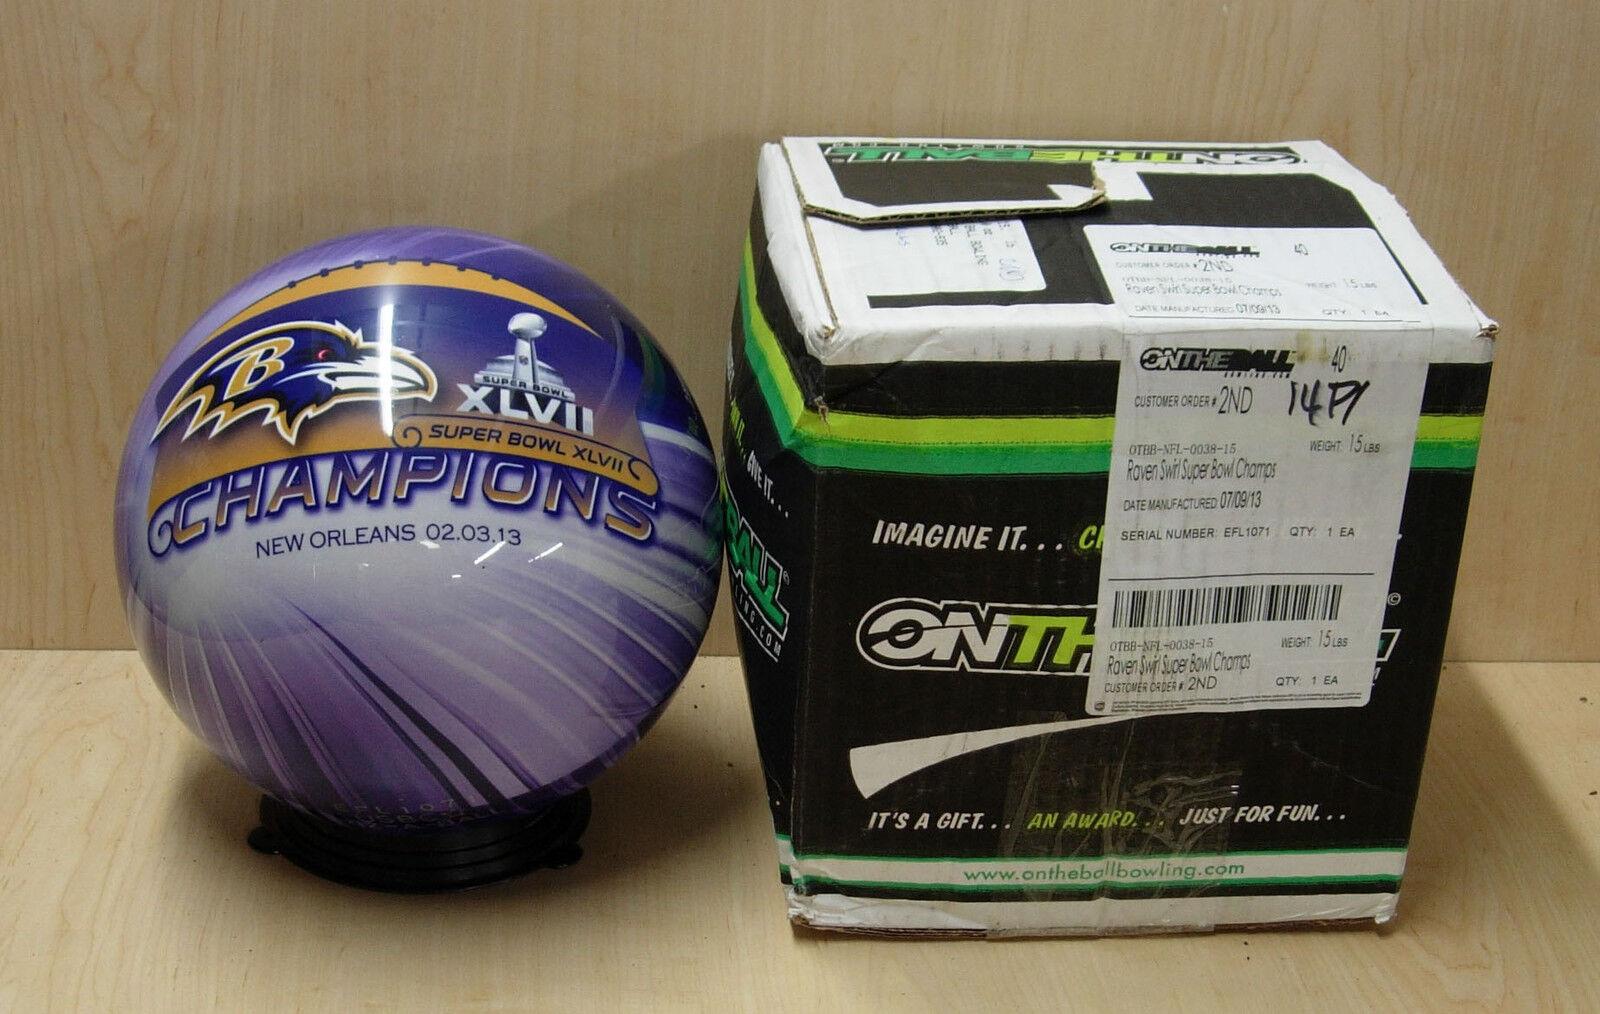 = 15NIB Bowling Ball ON THE BALL BOWLING 2nd RAVENS SUPER BOWL 2013 CHAMPIONS